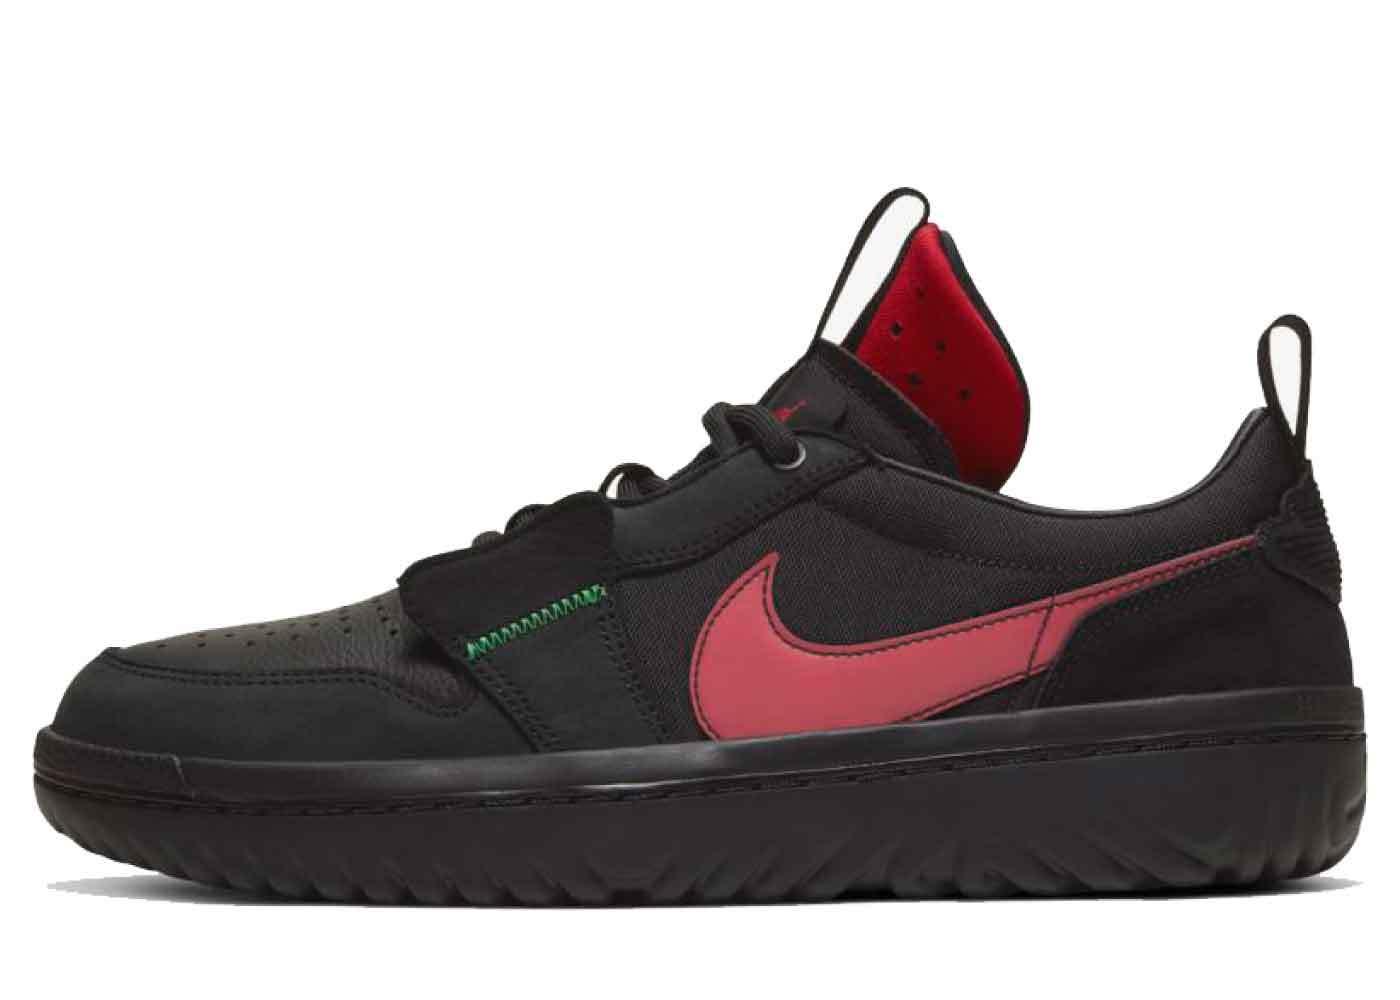 Nike Air Jordan 1 Low React Fearless Ghetto Gastroの写真